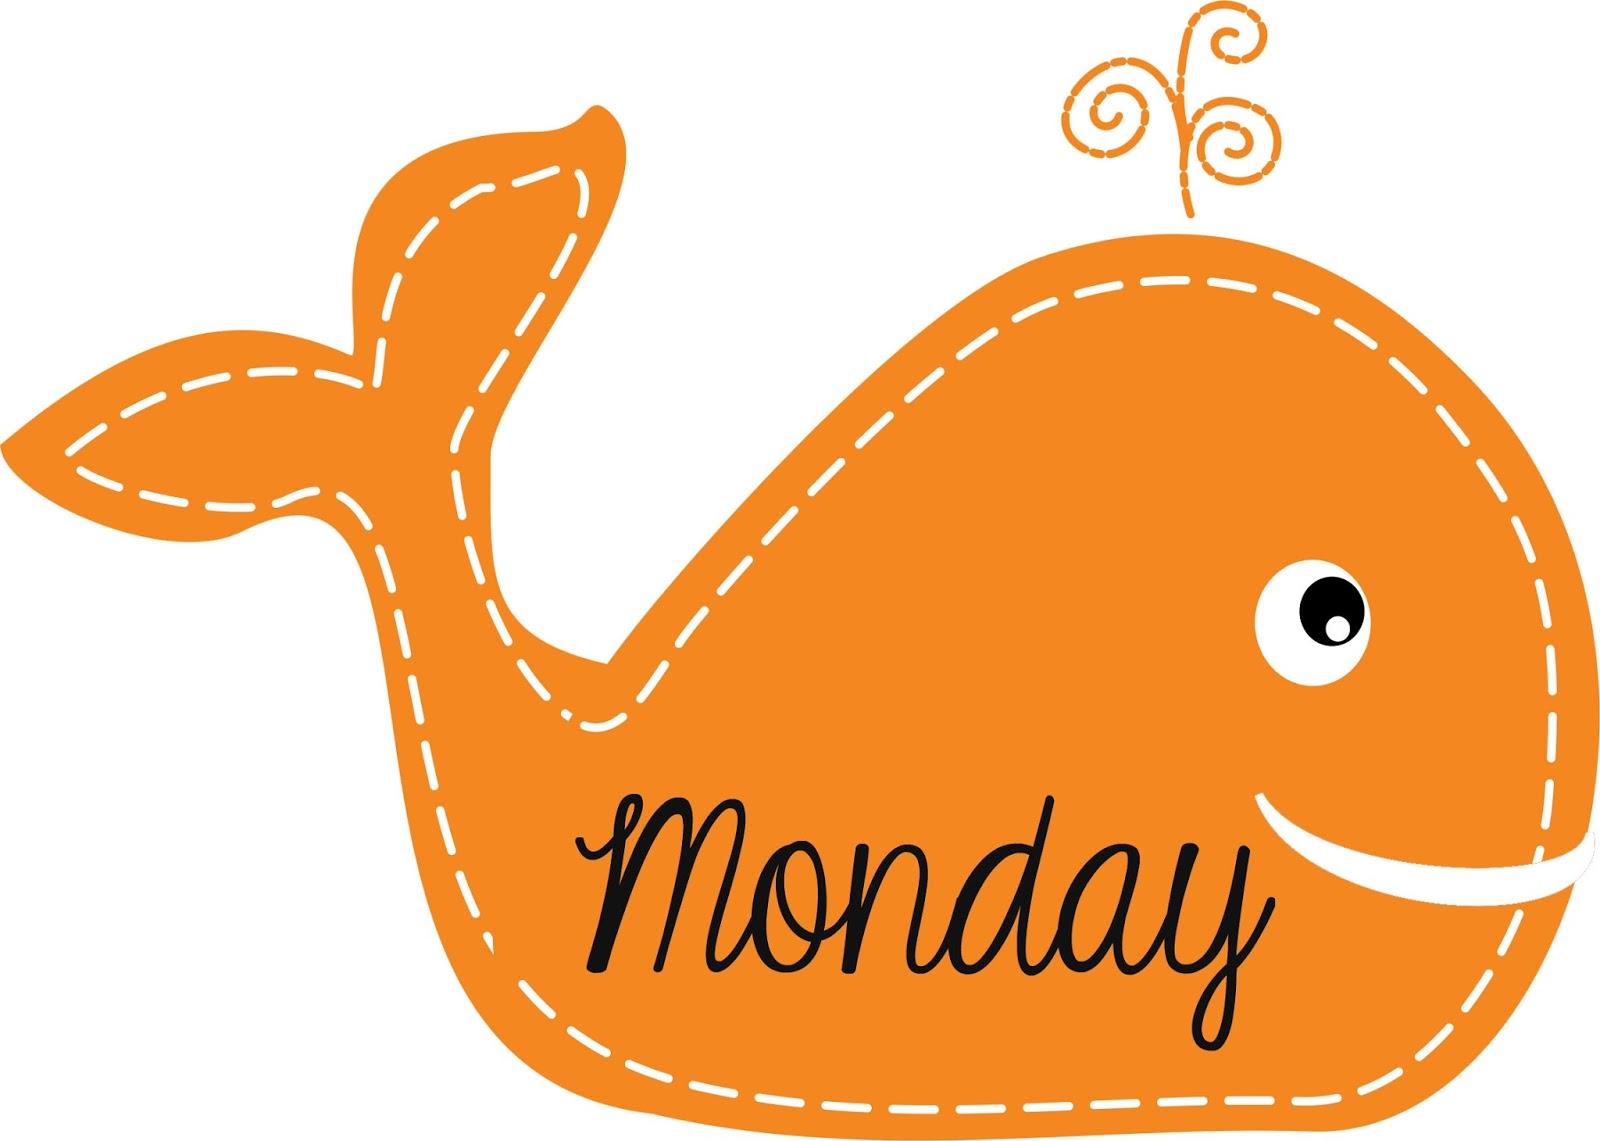 Free Monday Cliparts, Download Free Clip Art, Free Clip Art.